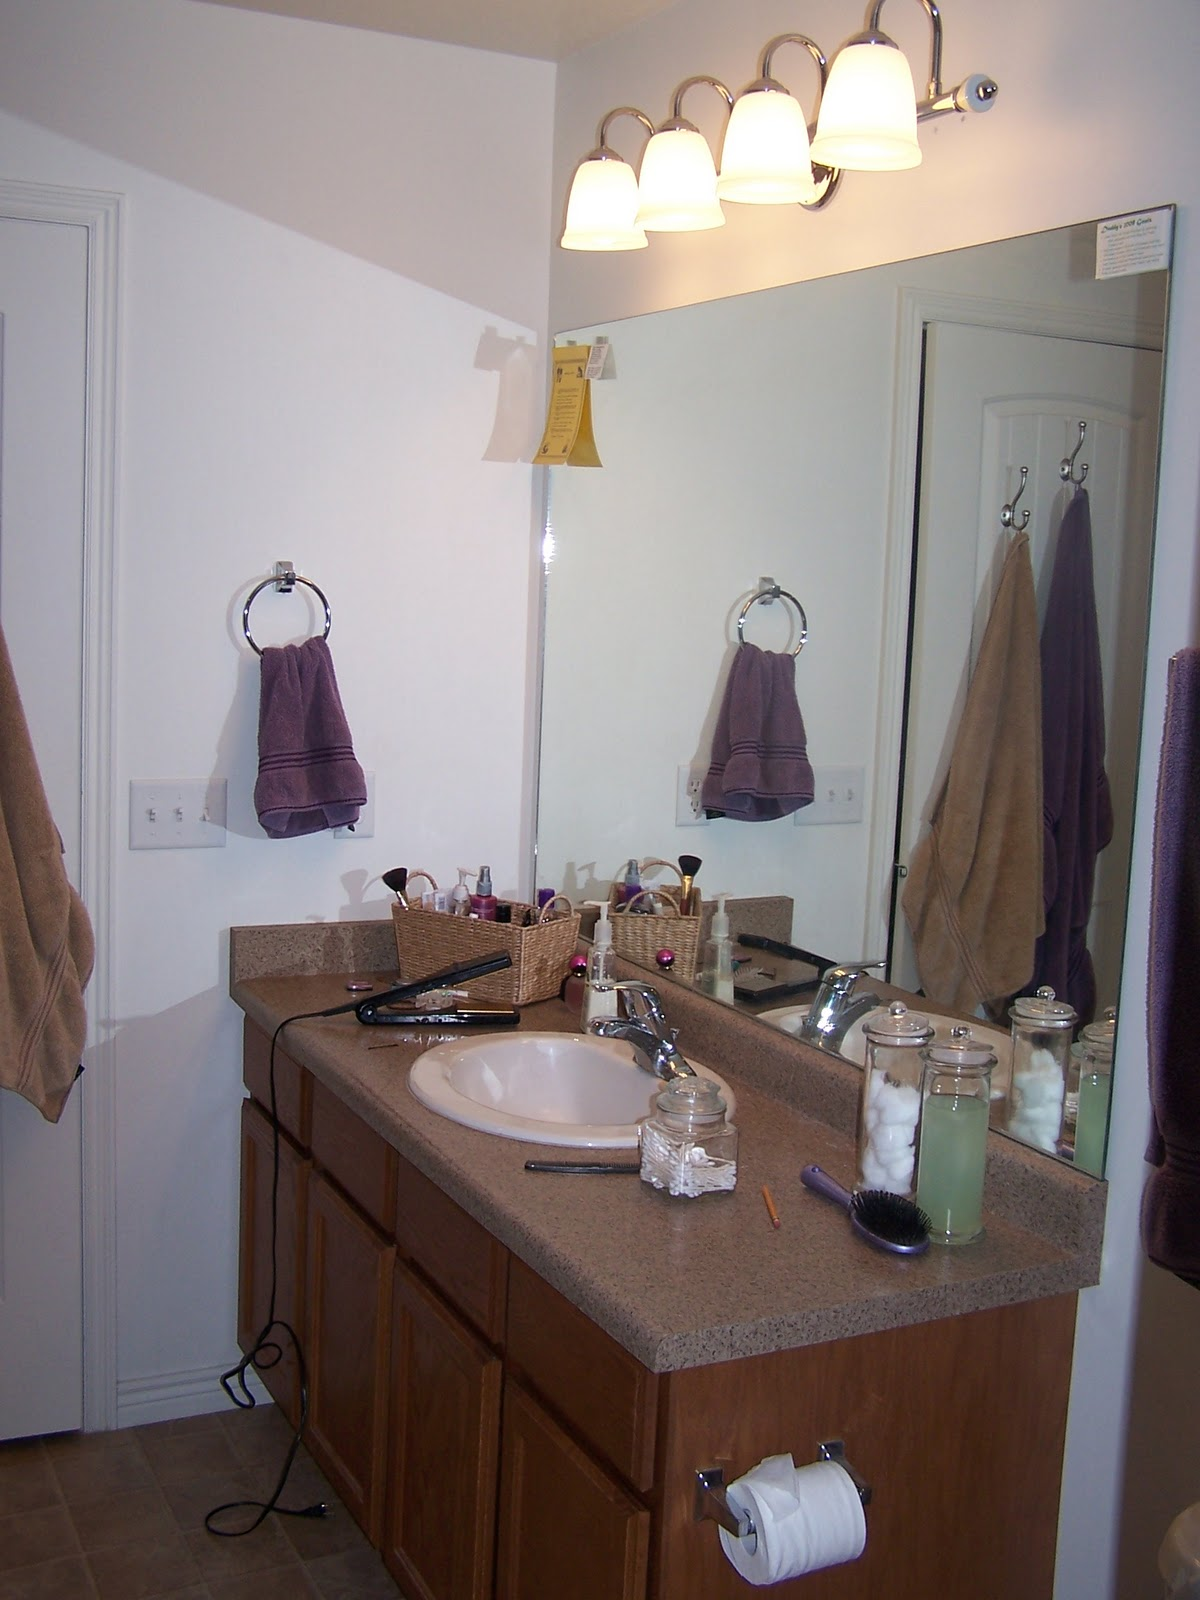 Complete DIY Master Bathroom Remodel!!!